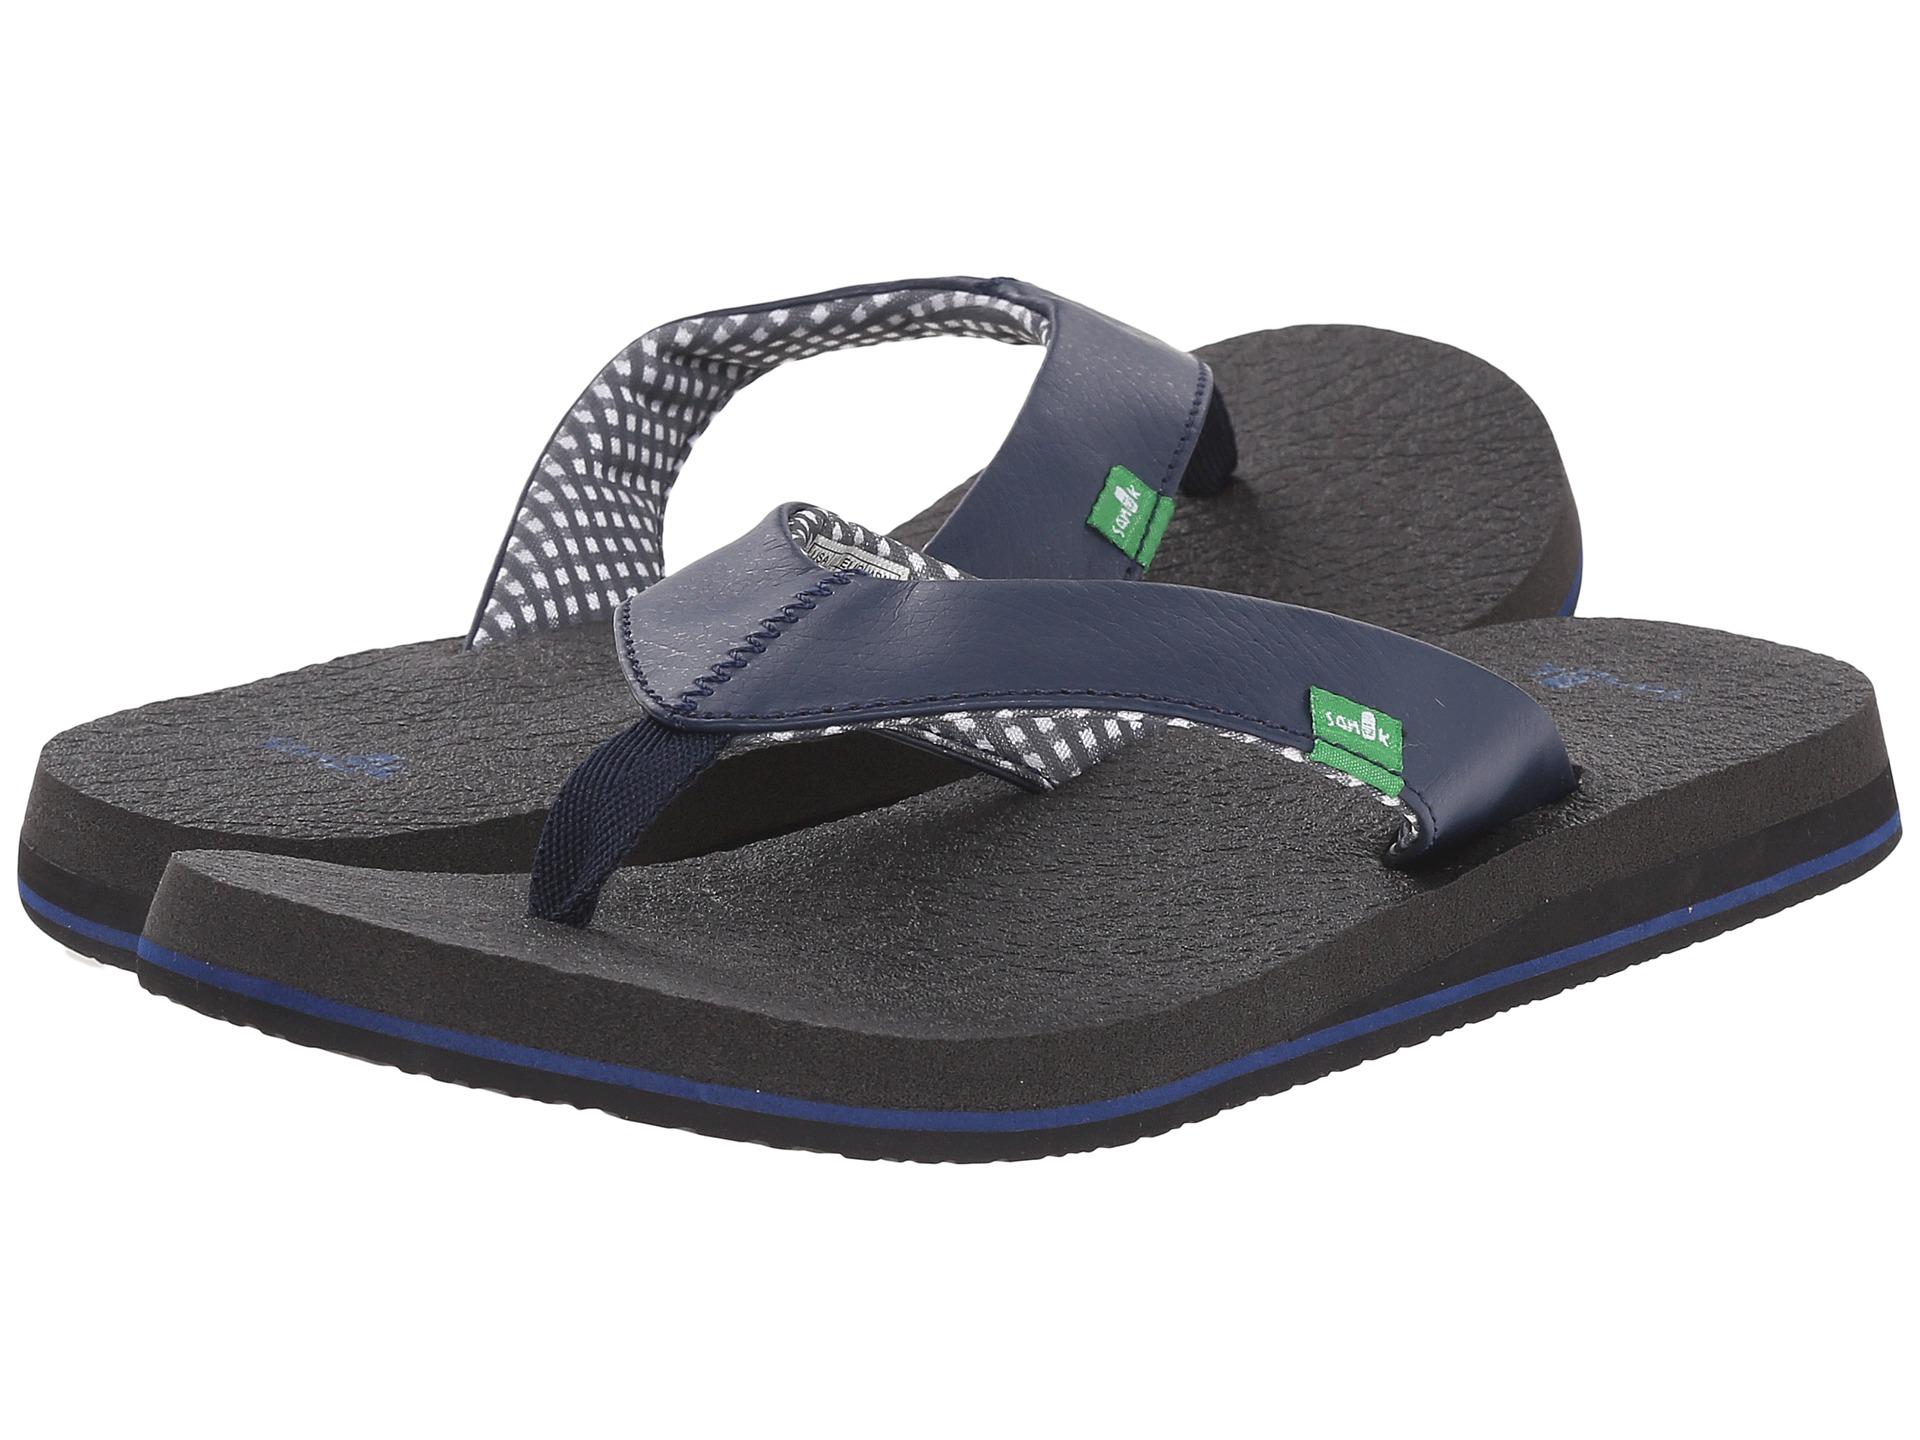 sanuk mats flops fashions yoga kums mat sandals black flip